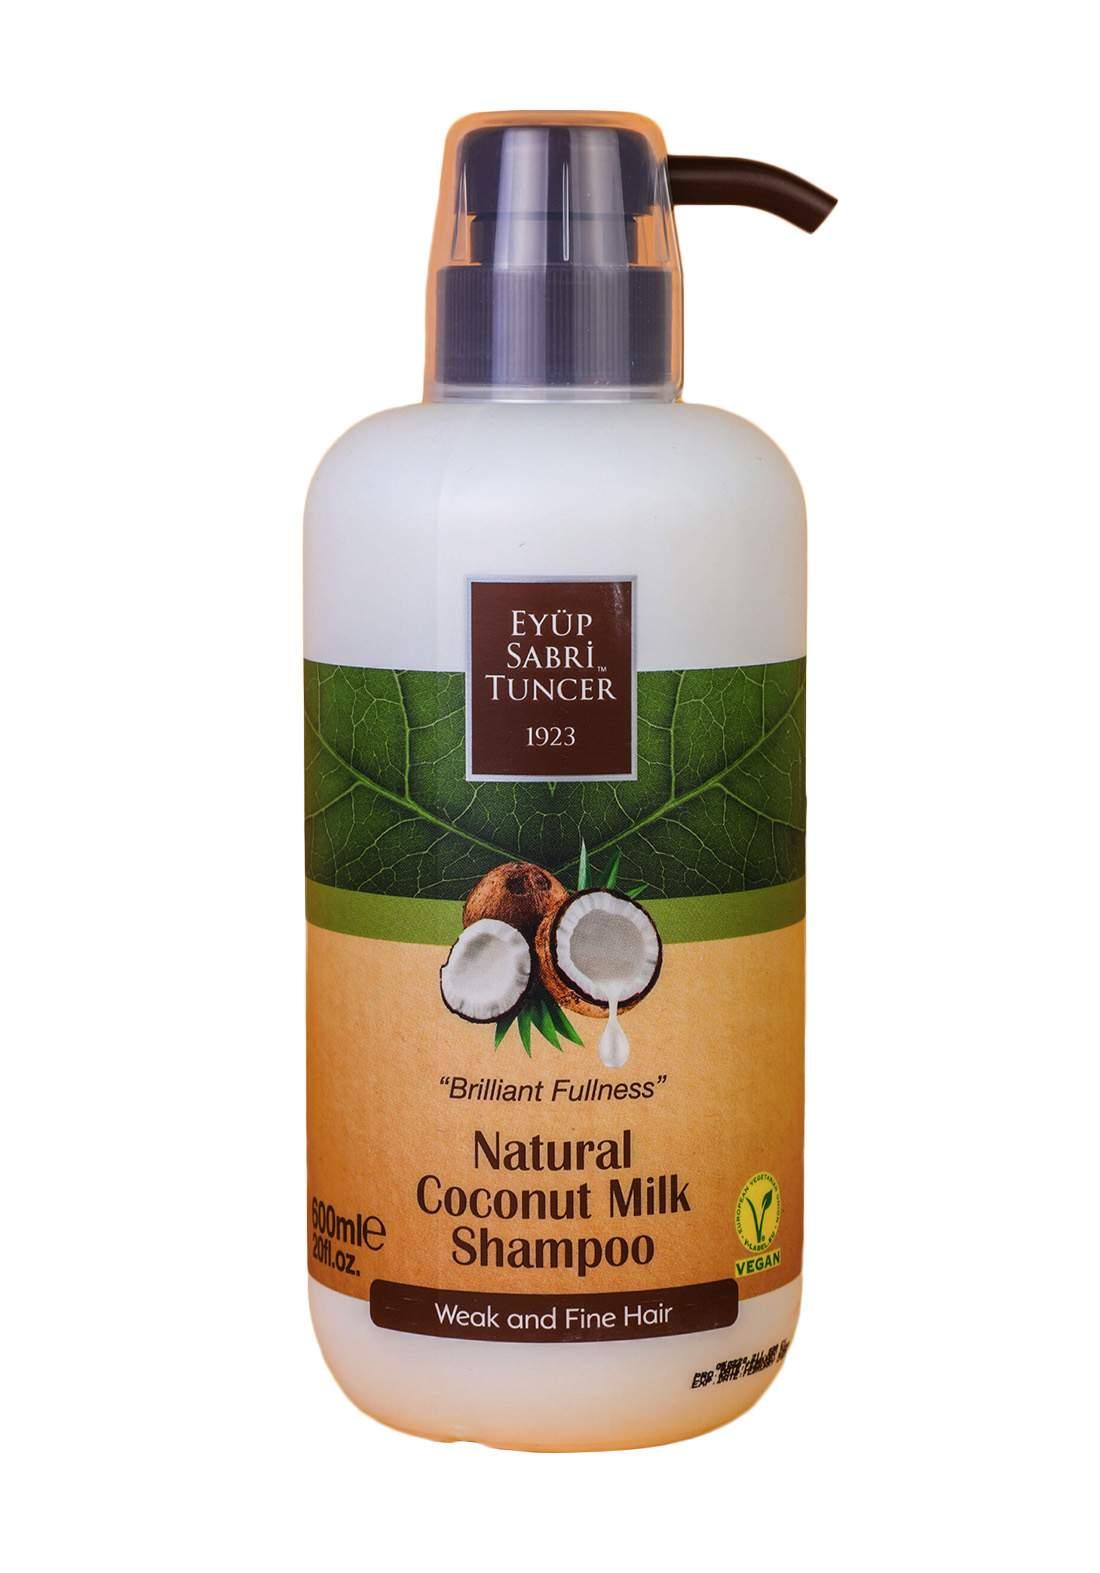 Eyup Sabri Tuncer Natural Coconut Milk Vegan Shampoo 600ml شامبو بجوز الهند الطبيعي